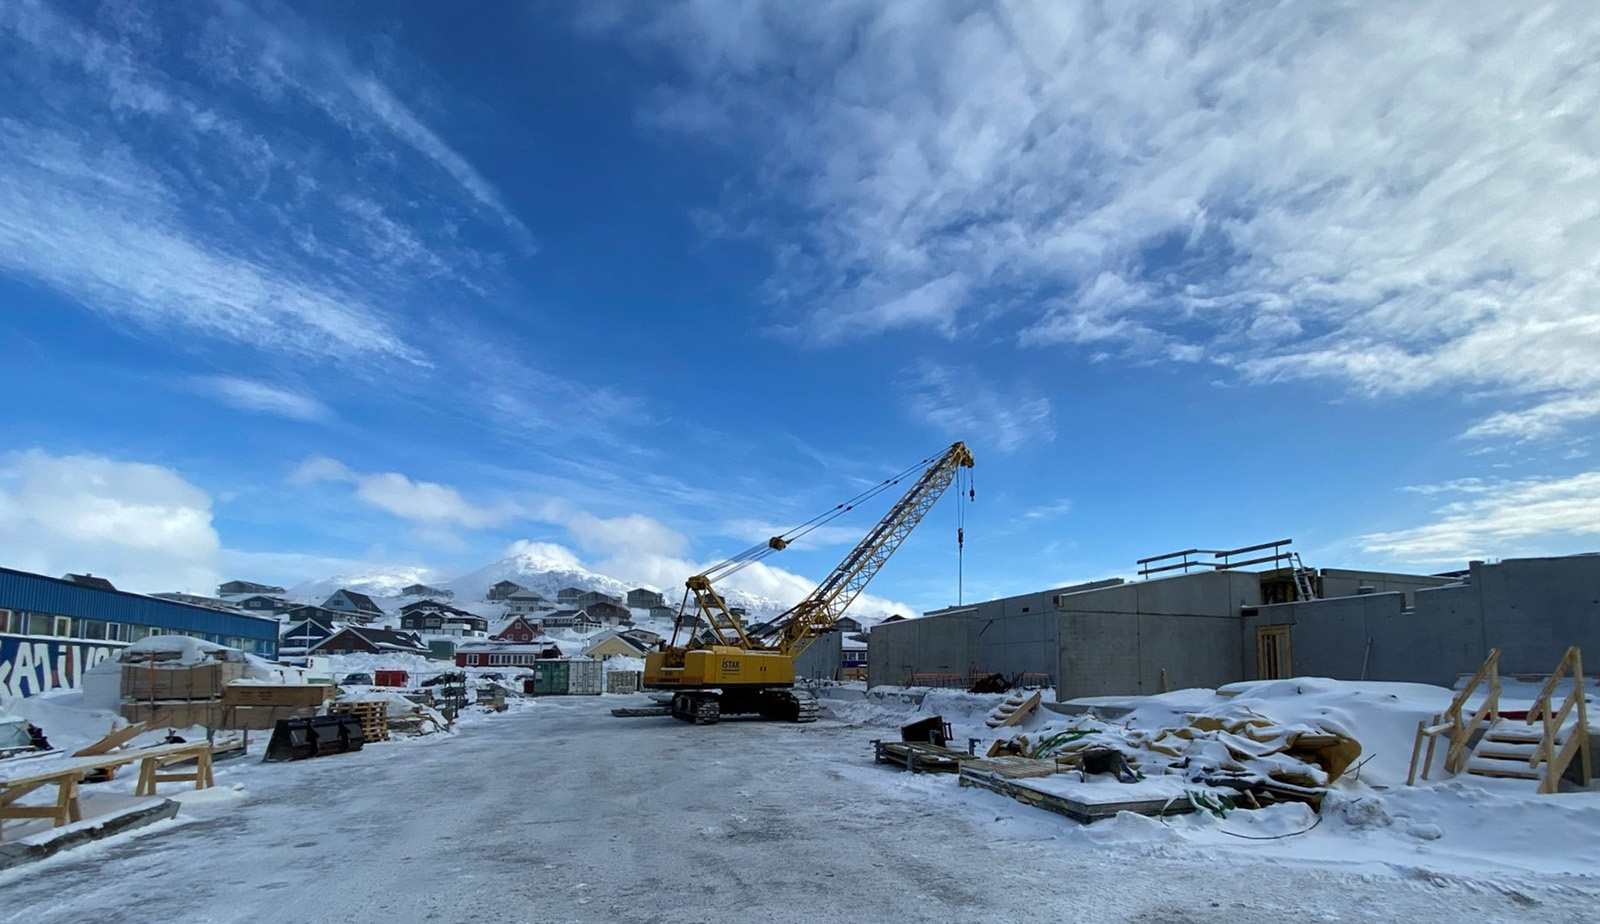 Nuuk skole byggeplads